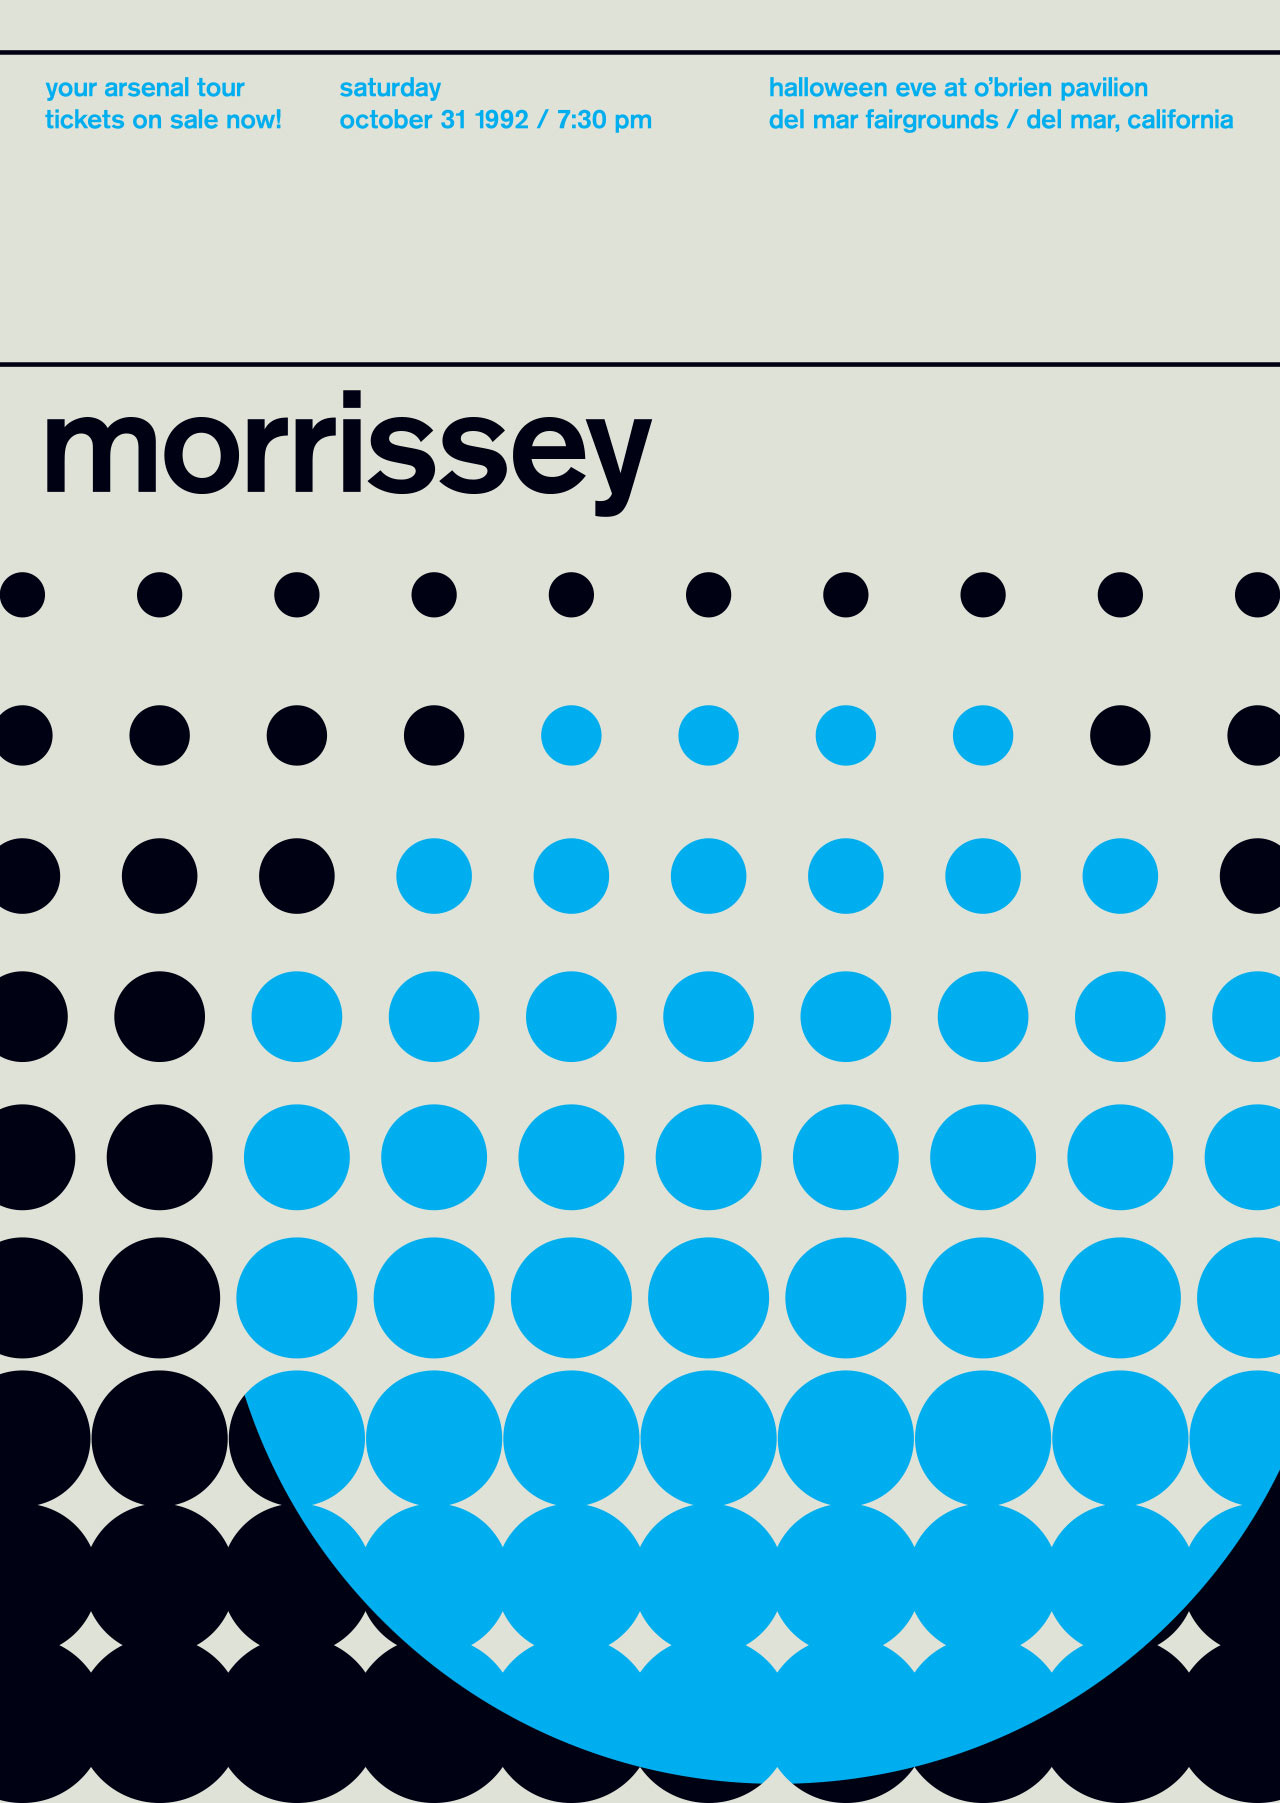 Swissted-Legends_Posters-11-morrissey_legends_series